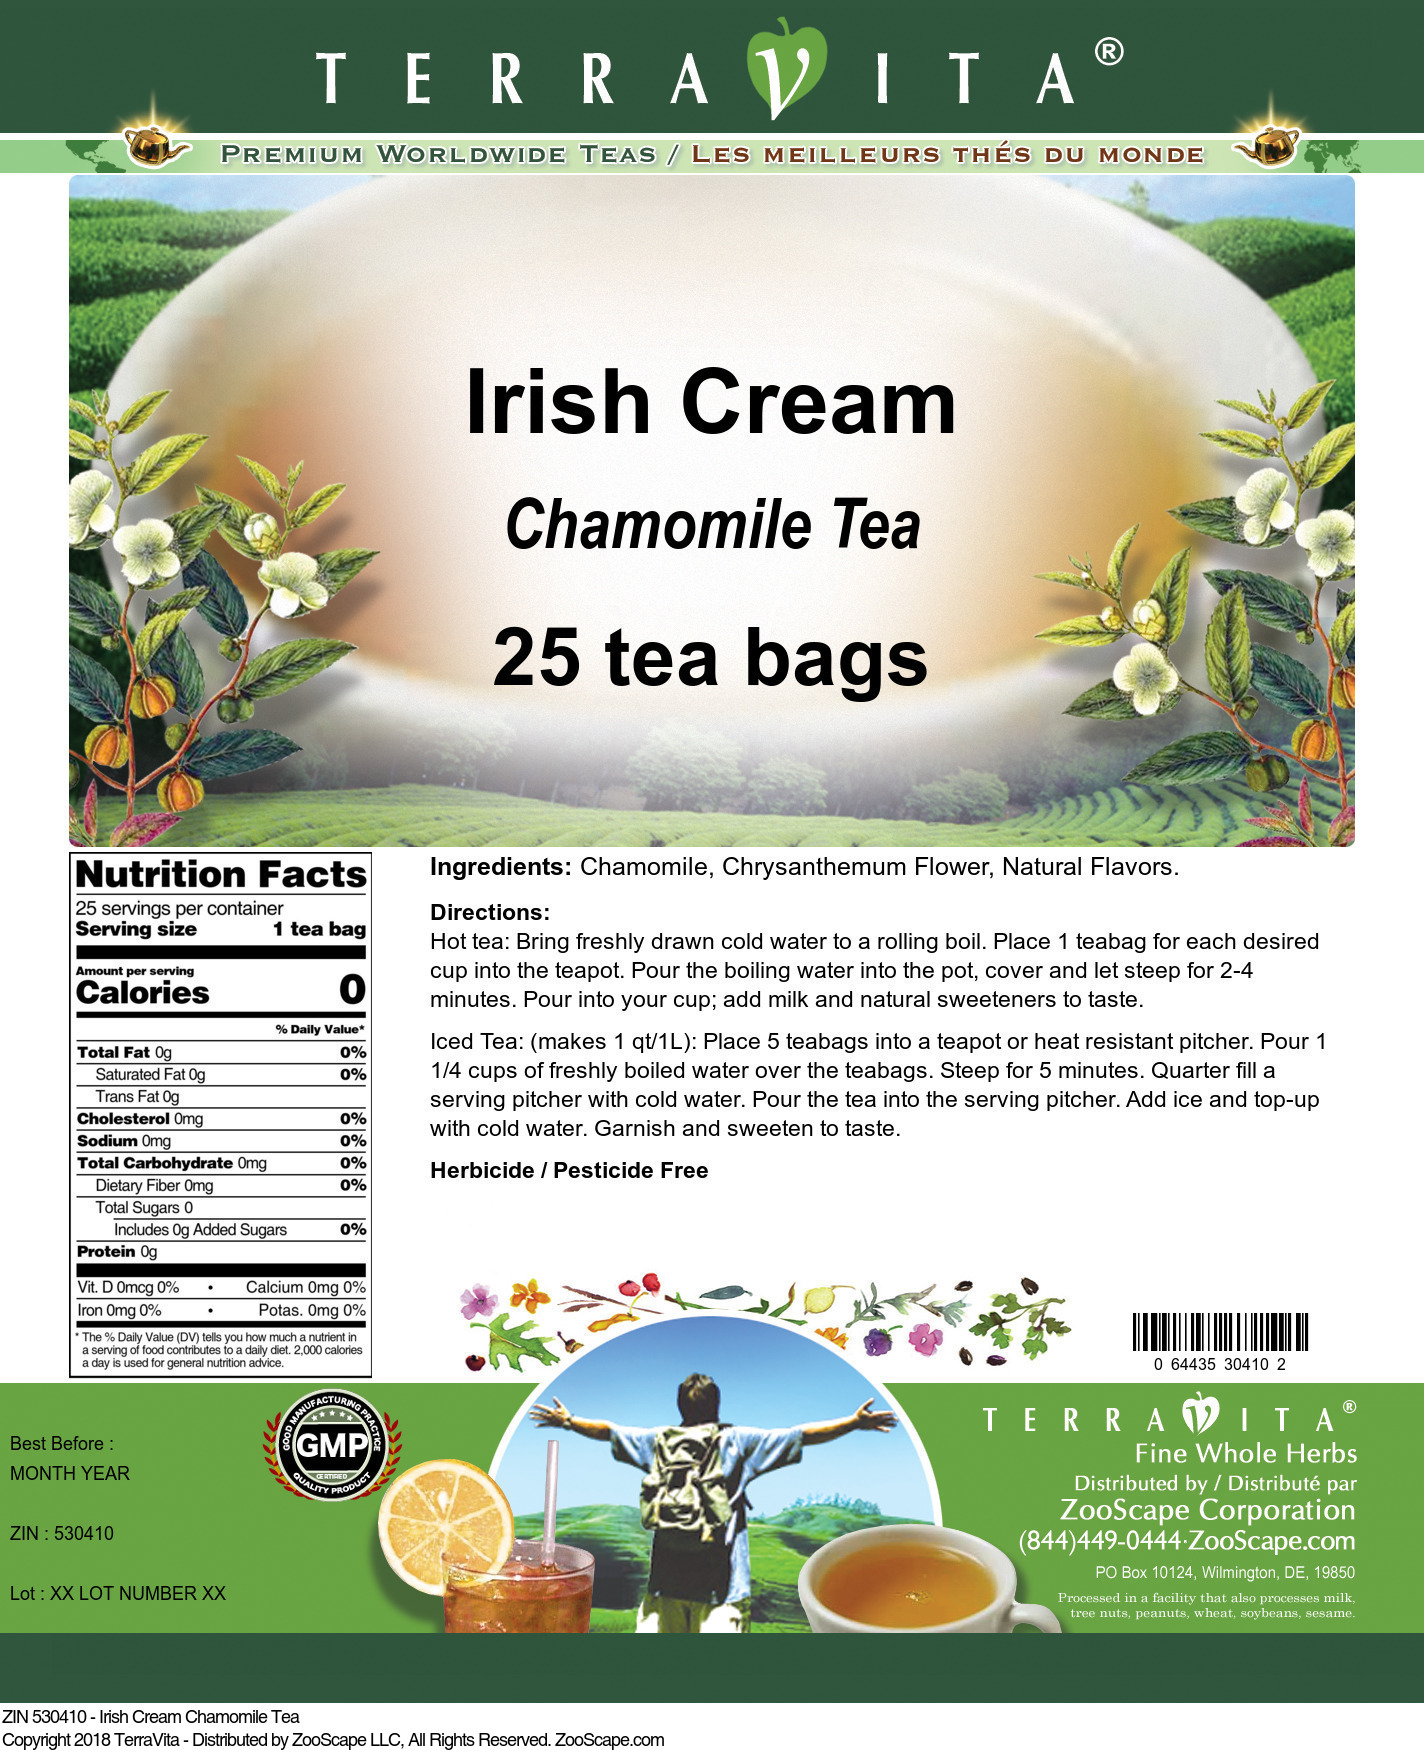 Irish Cream Chamomile Tea